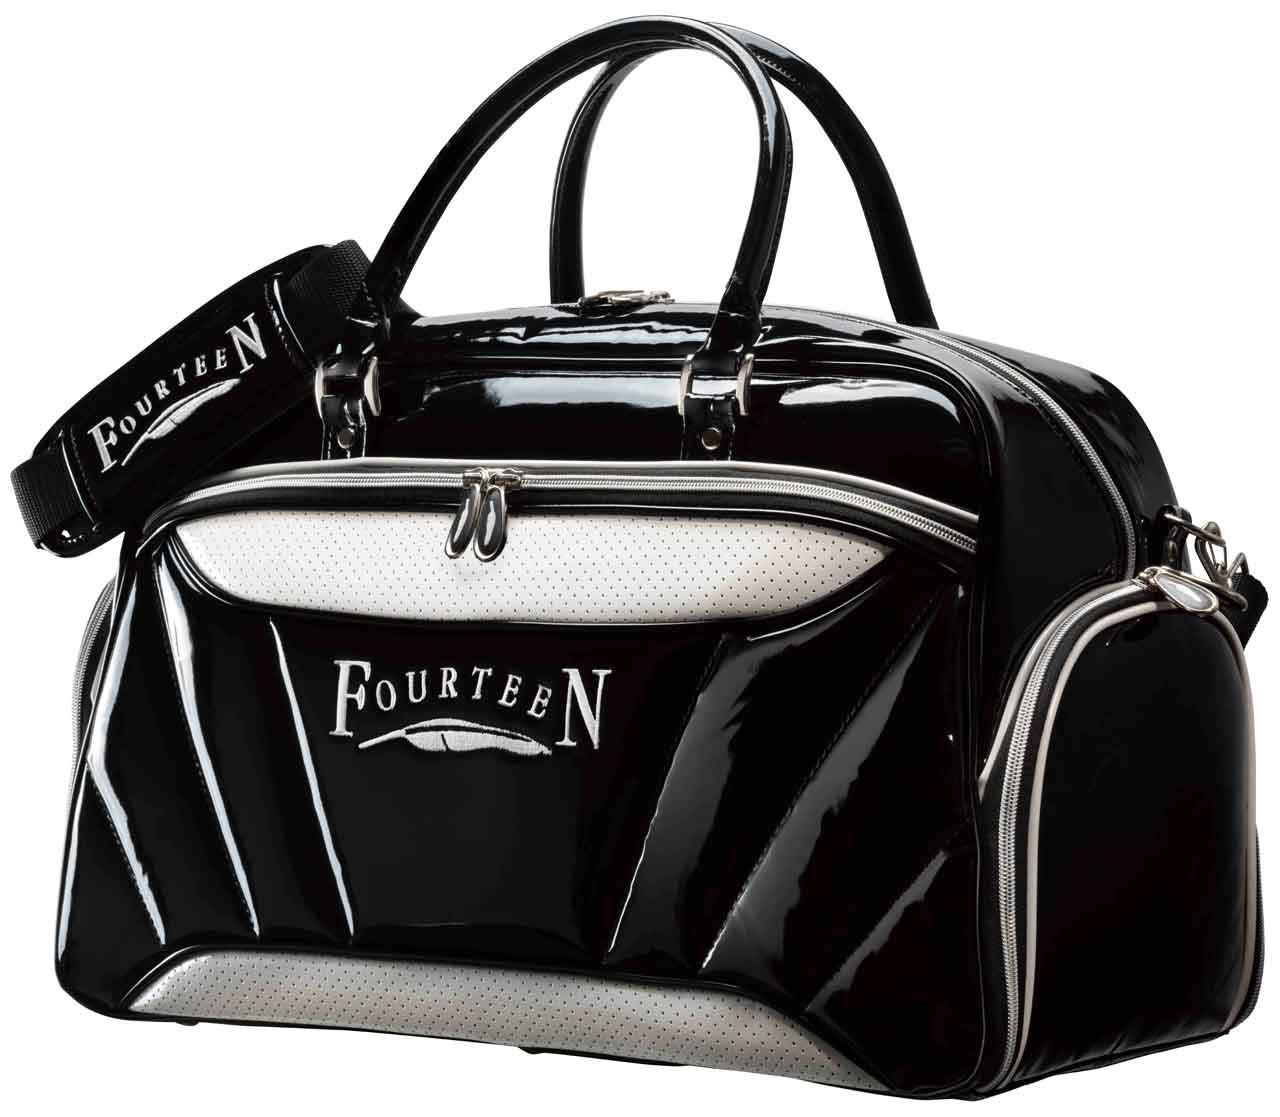 FOURTEEN(フォーティーン) ボストンバッグ BB0209 ボストンバッグ メンズ ブラック×ホワイト カラー:ブラック×ホワイト   B07BSYYTWM